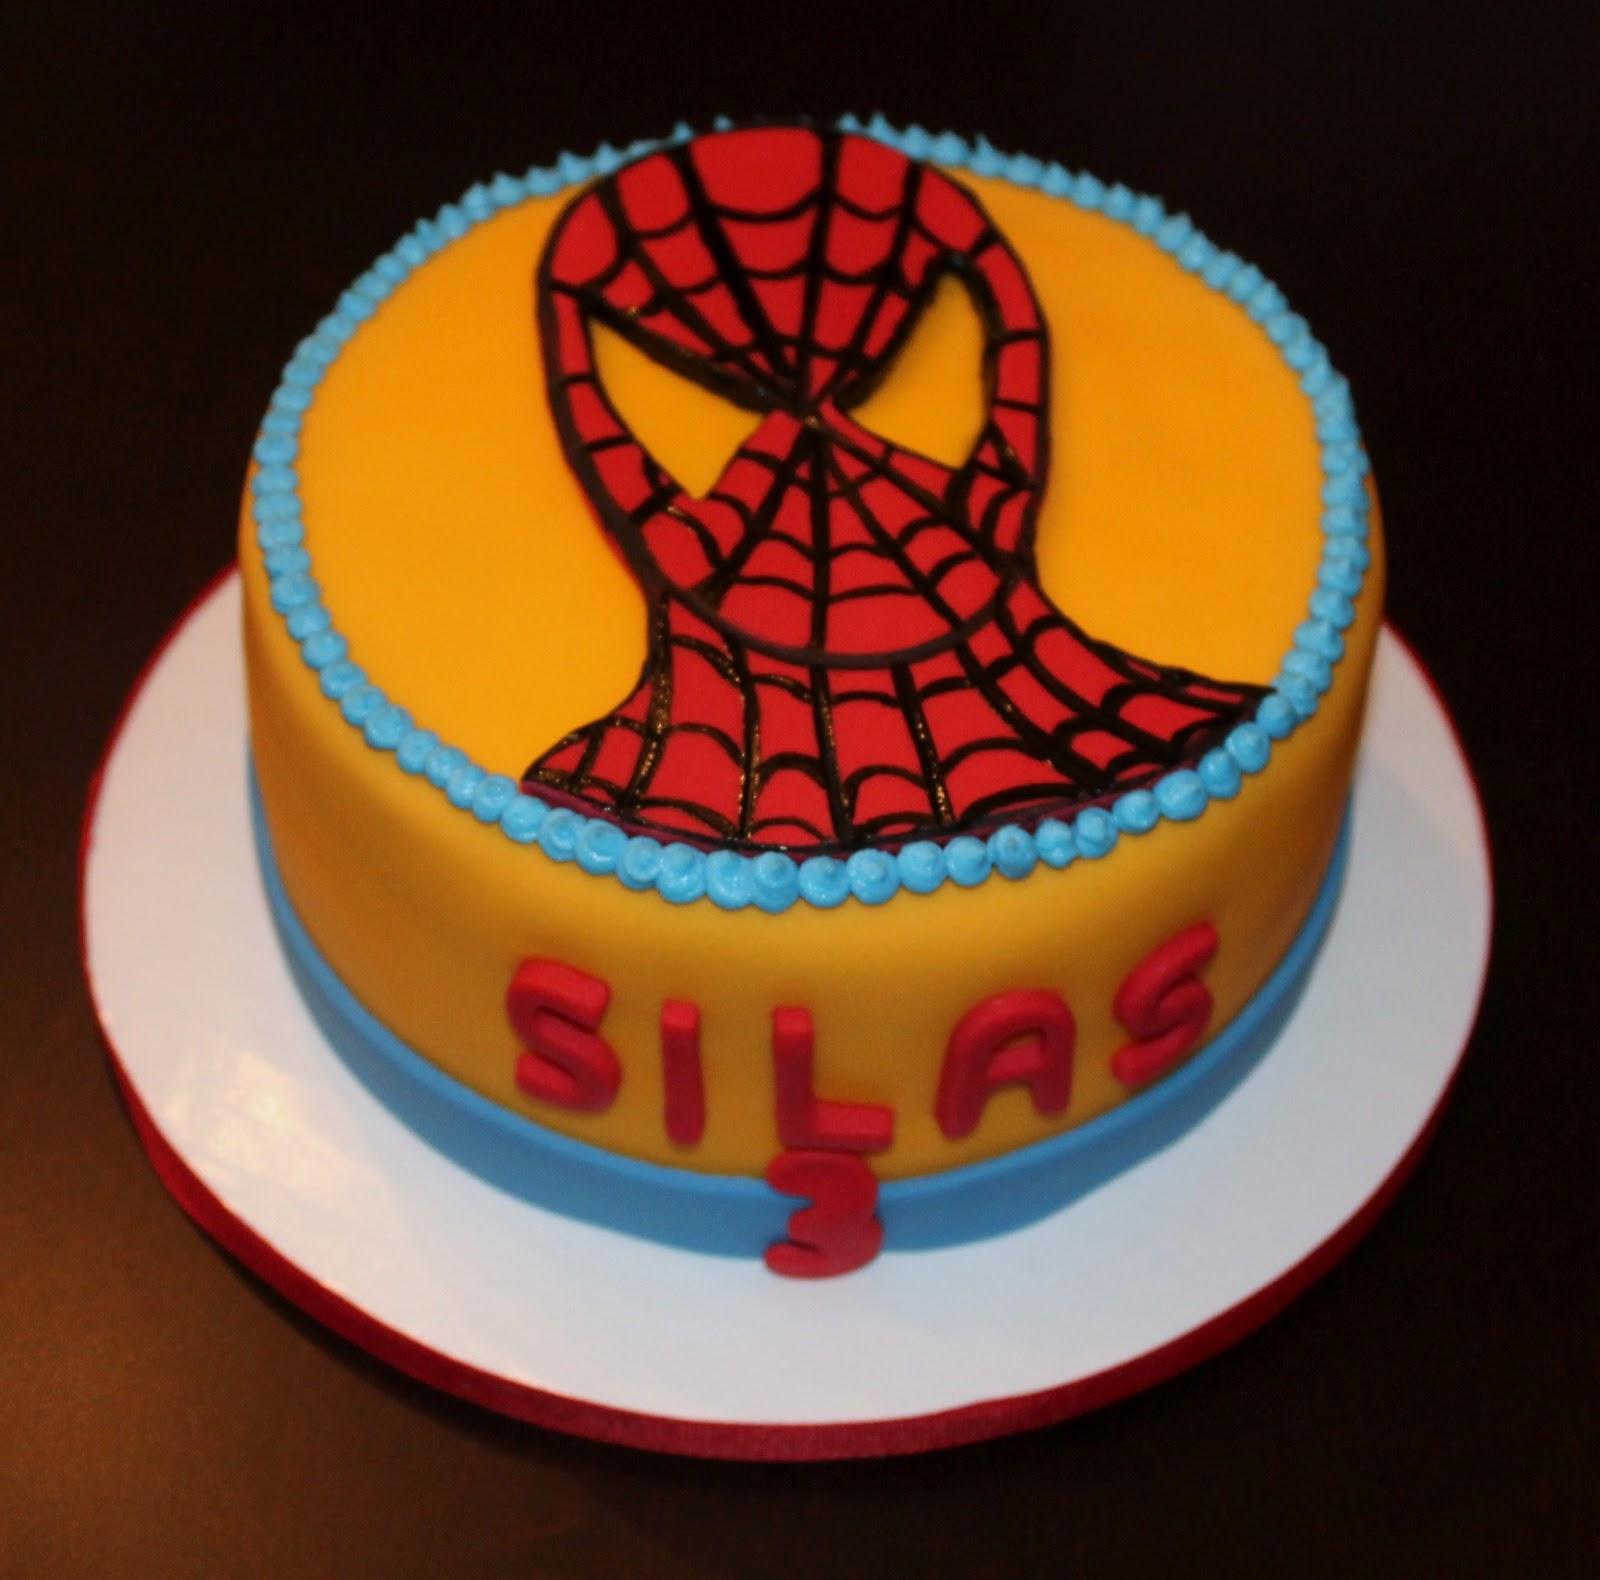 Creative Cakes By Lynn Spiderman Cake Gf Egg Free Dairy Free